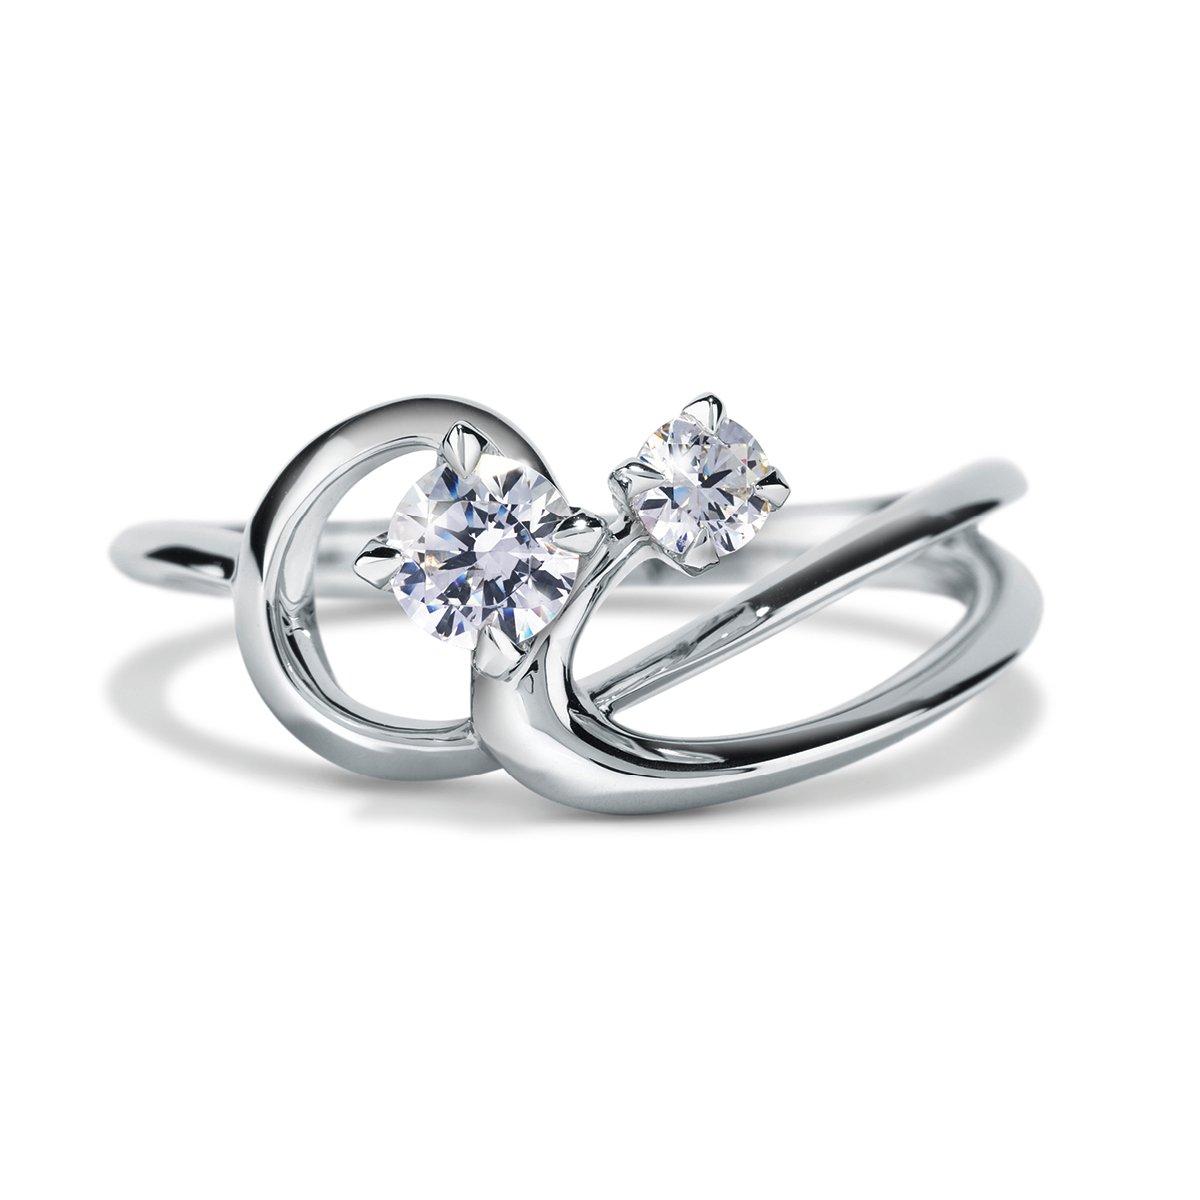 92d5740d8861 Atelier Swarovski Intimate Statement Ring